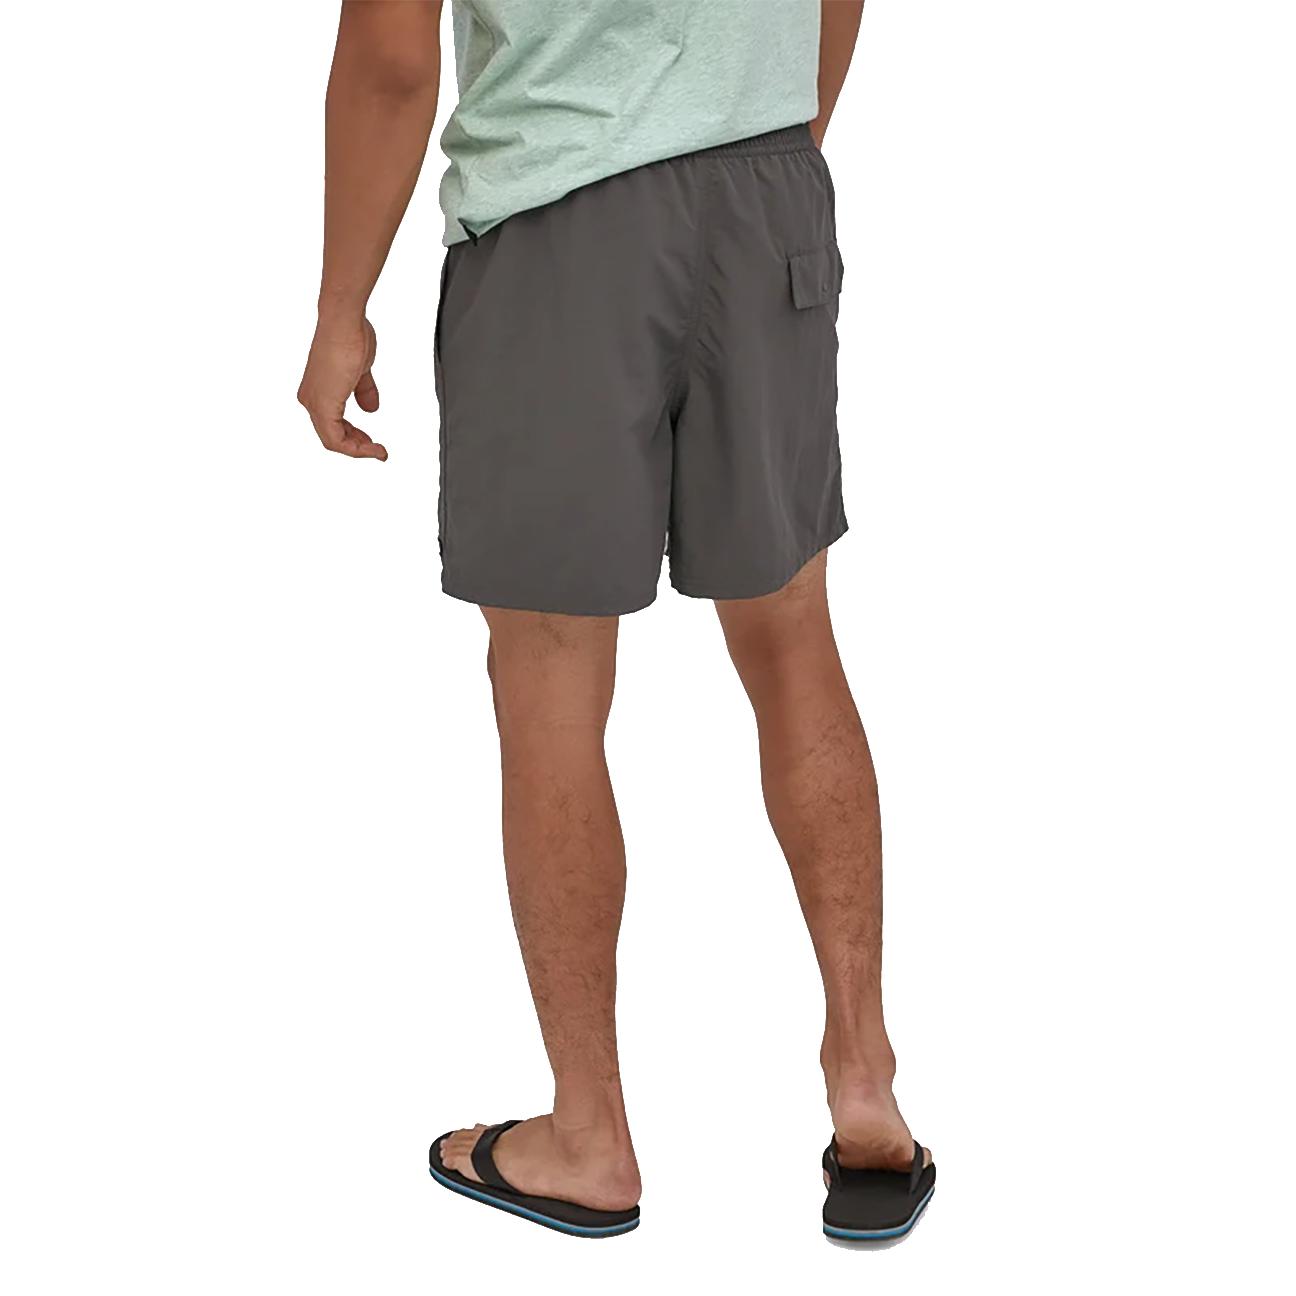 "Men's Baggies Shorts -5"", Forge Grey-3"